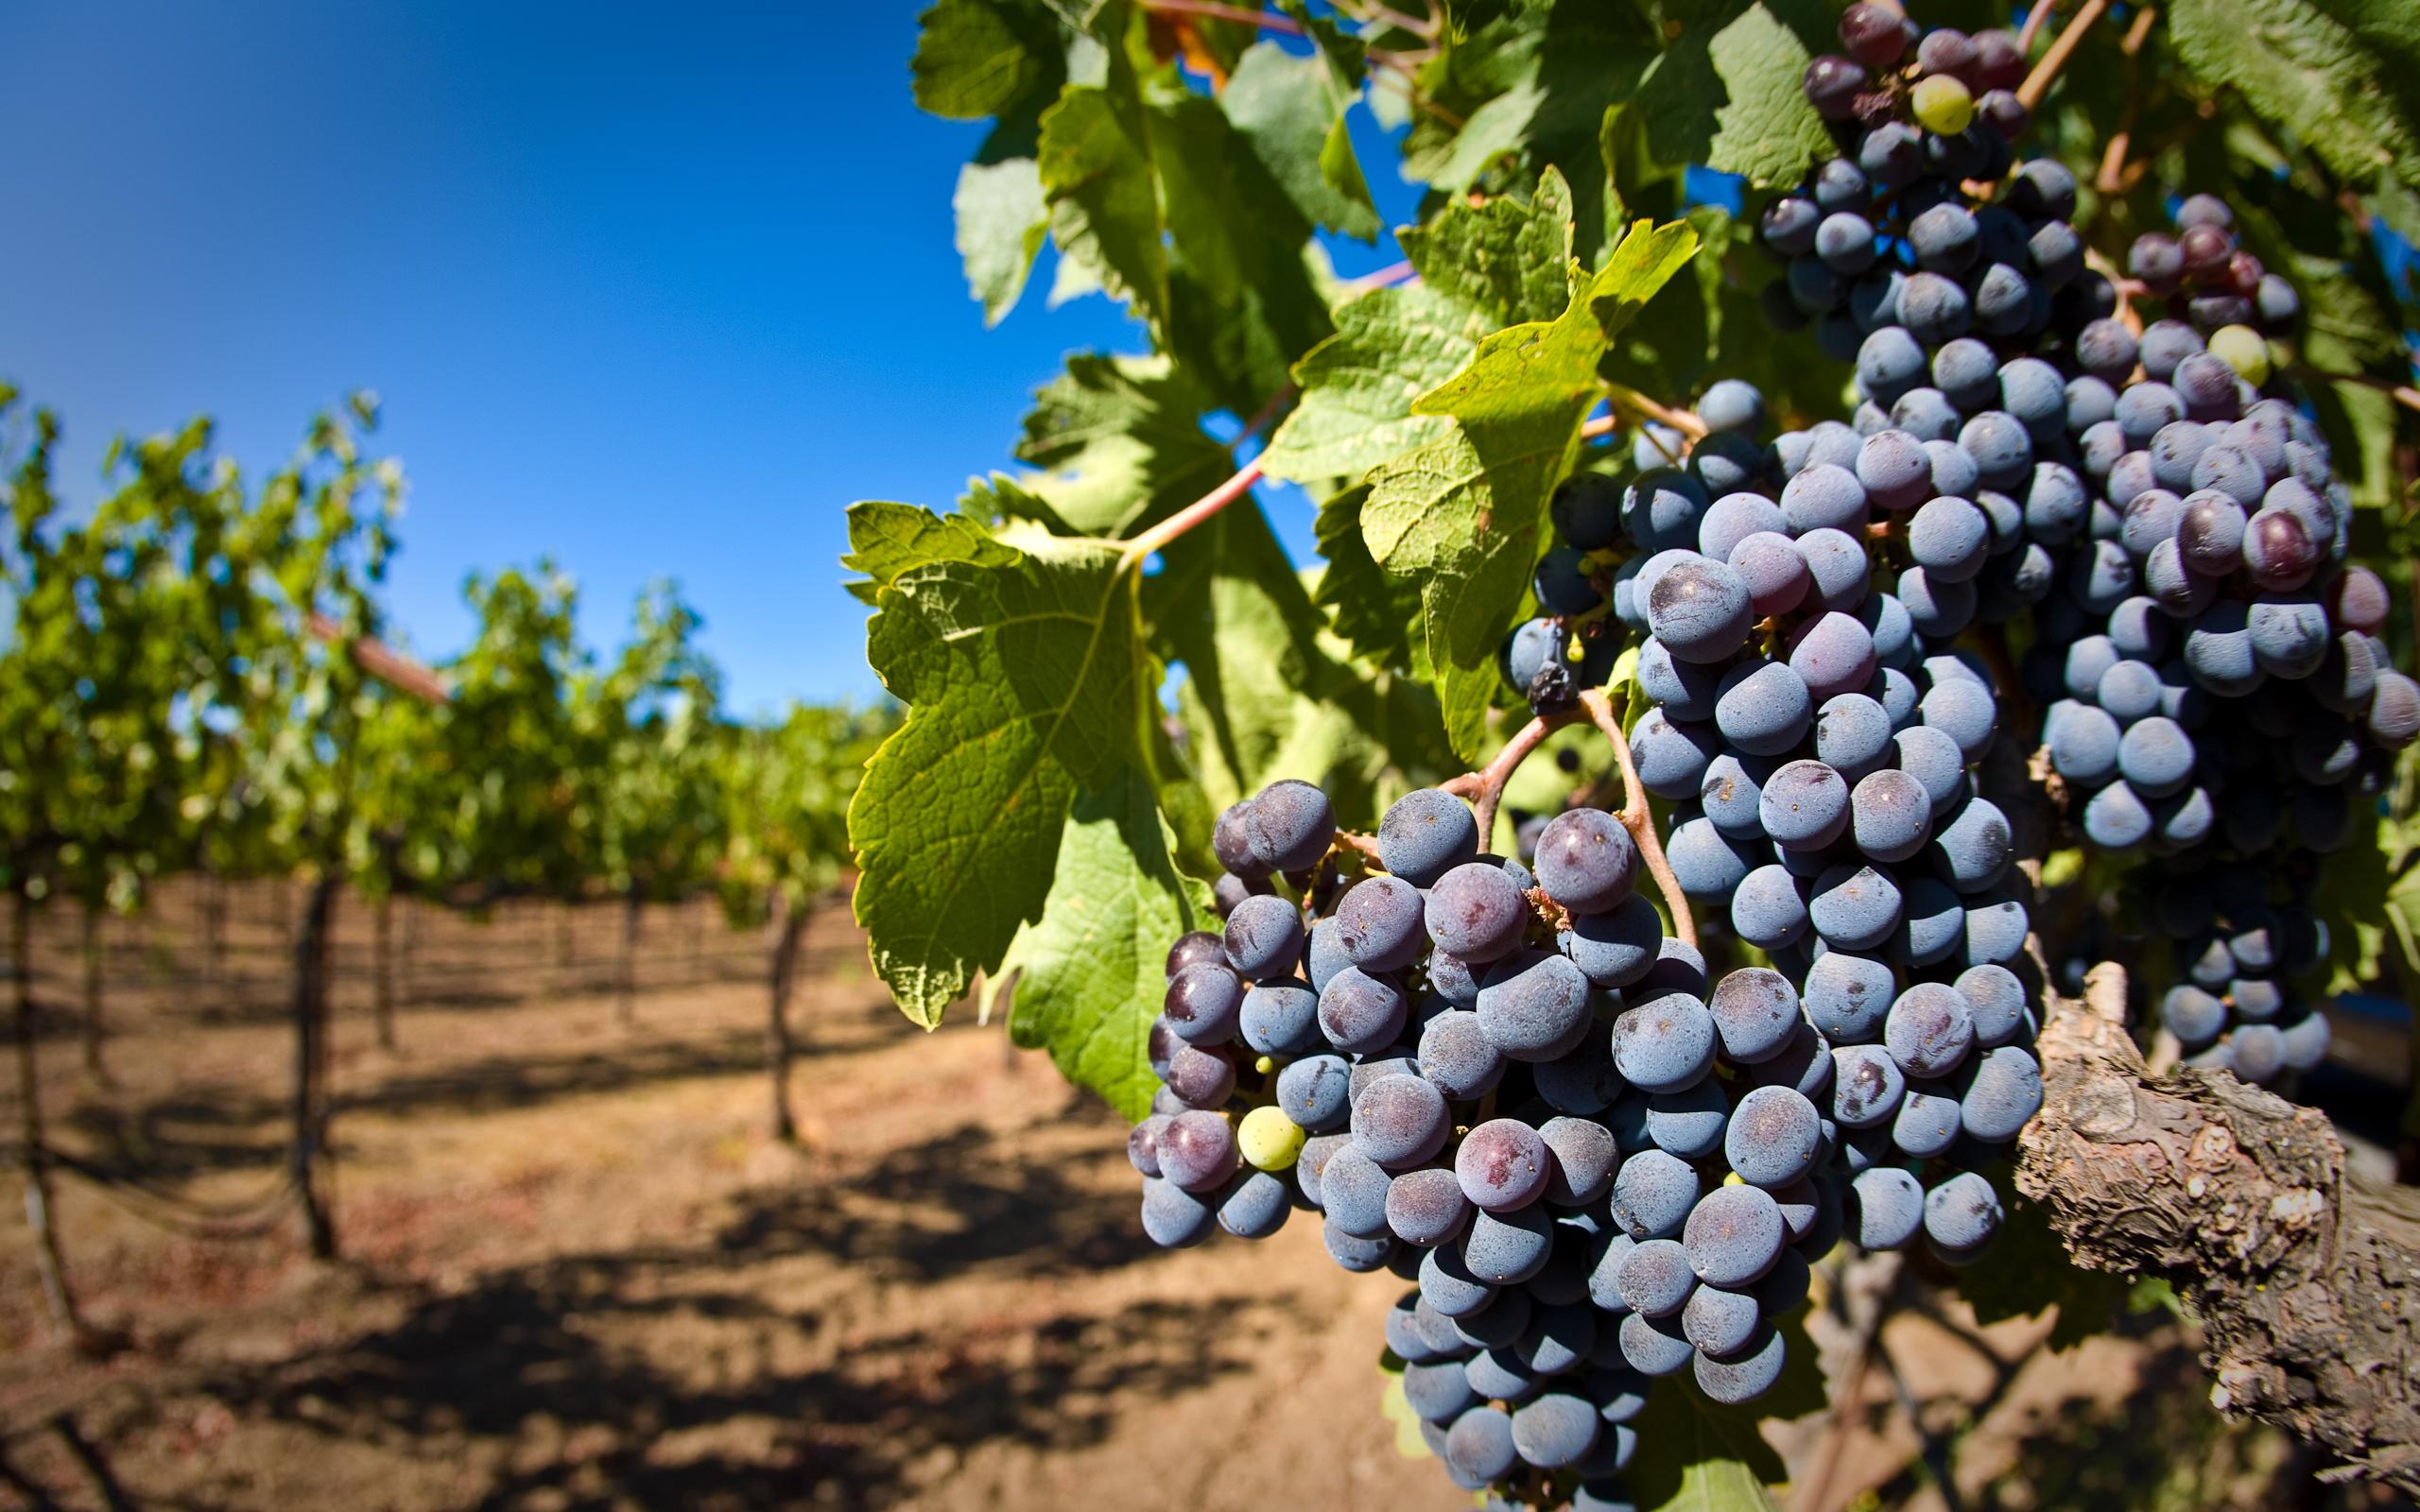 wine vineyard grapes producing wine bottles vine planting european union